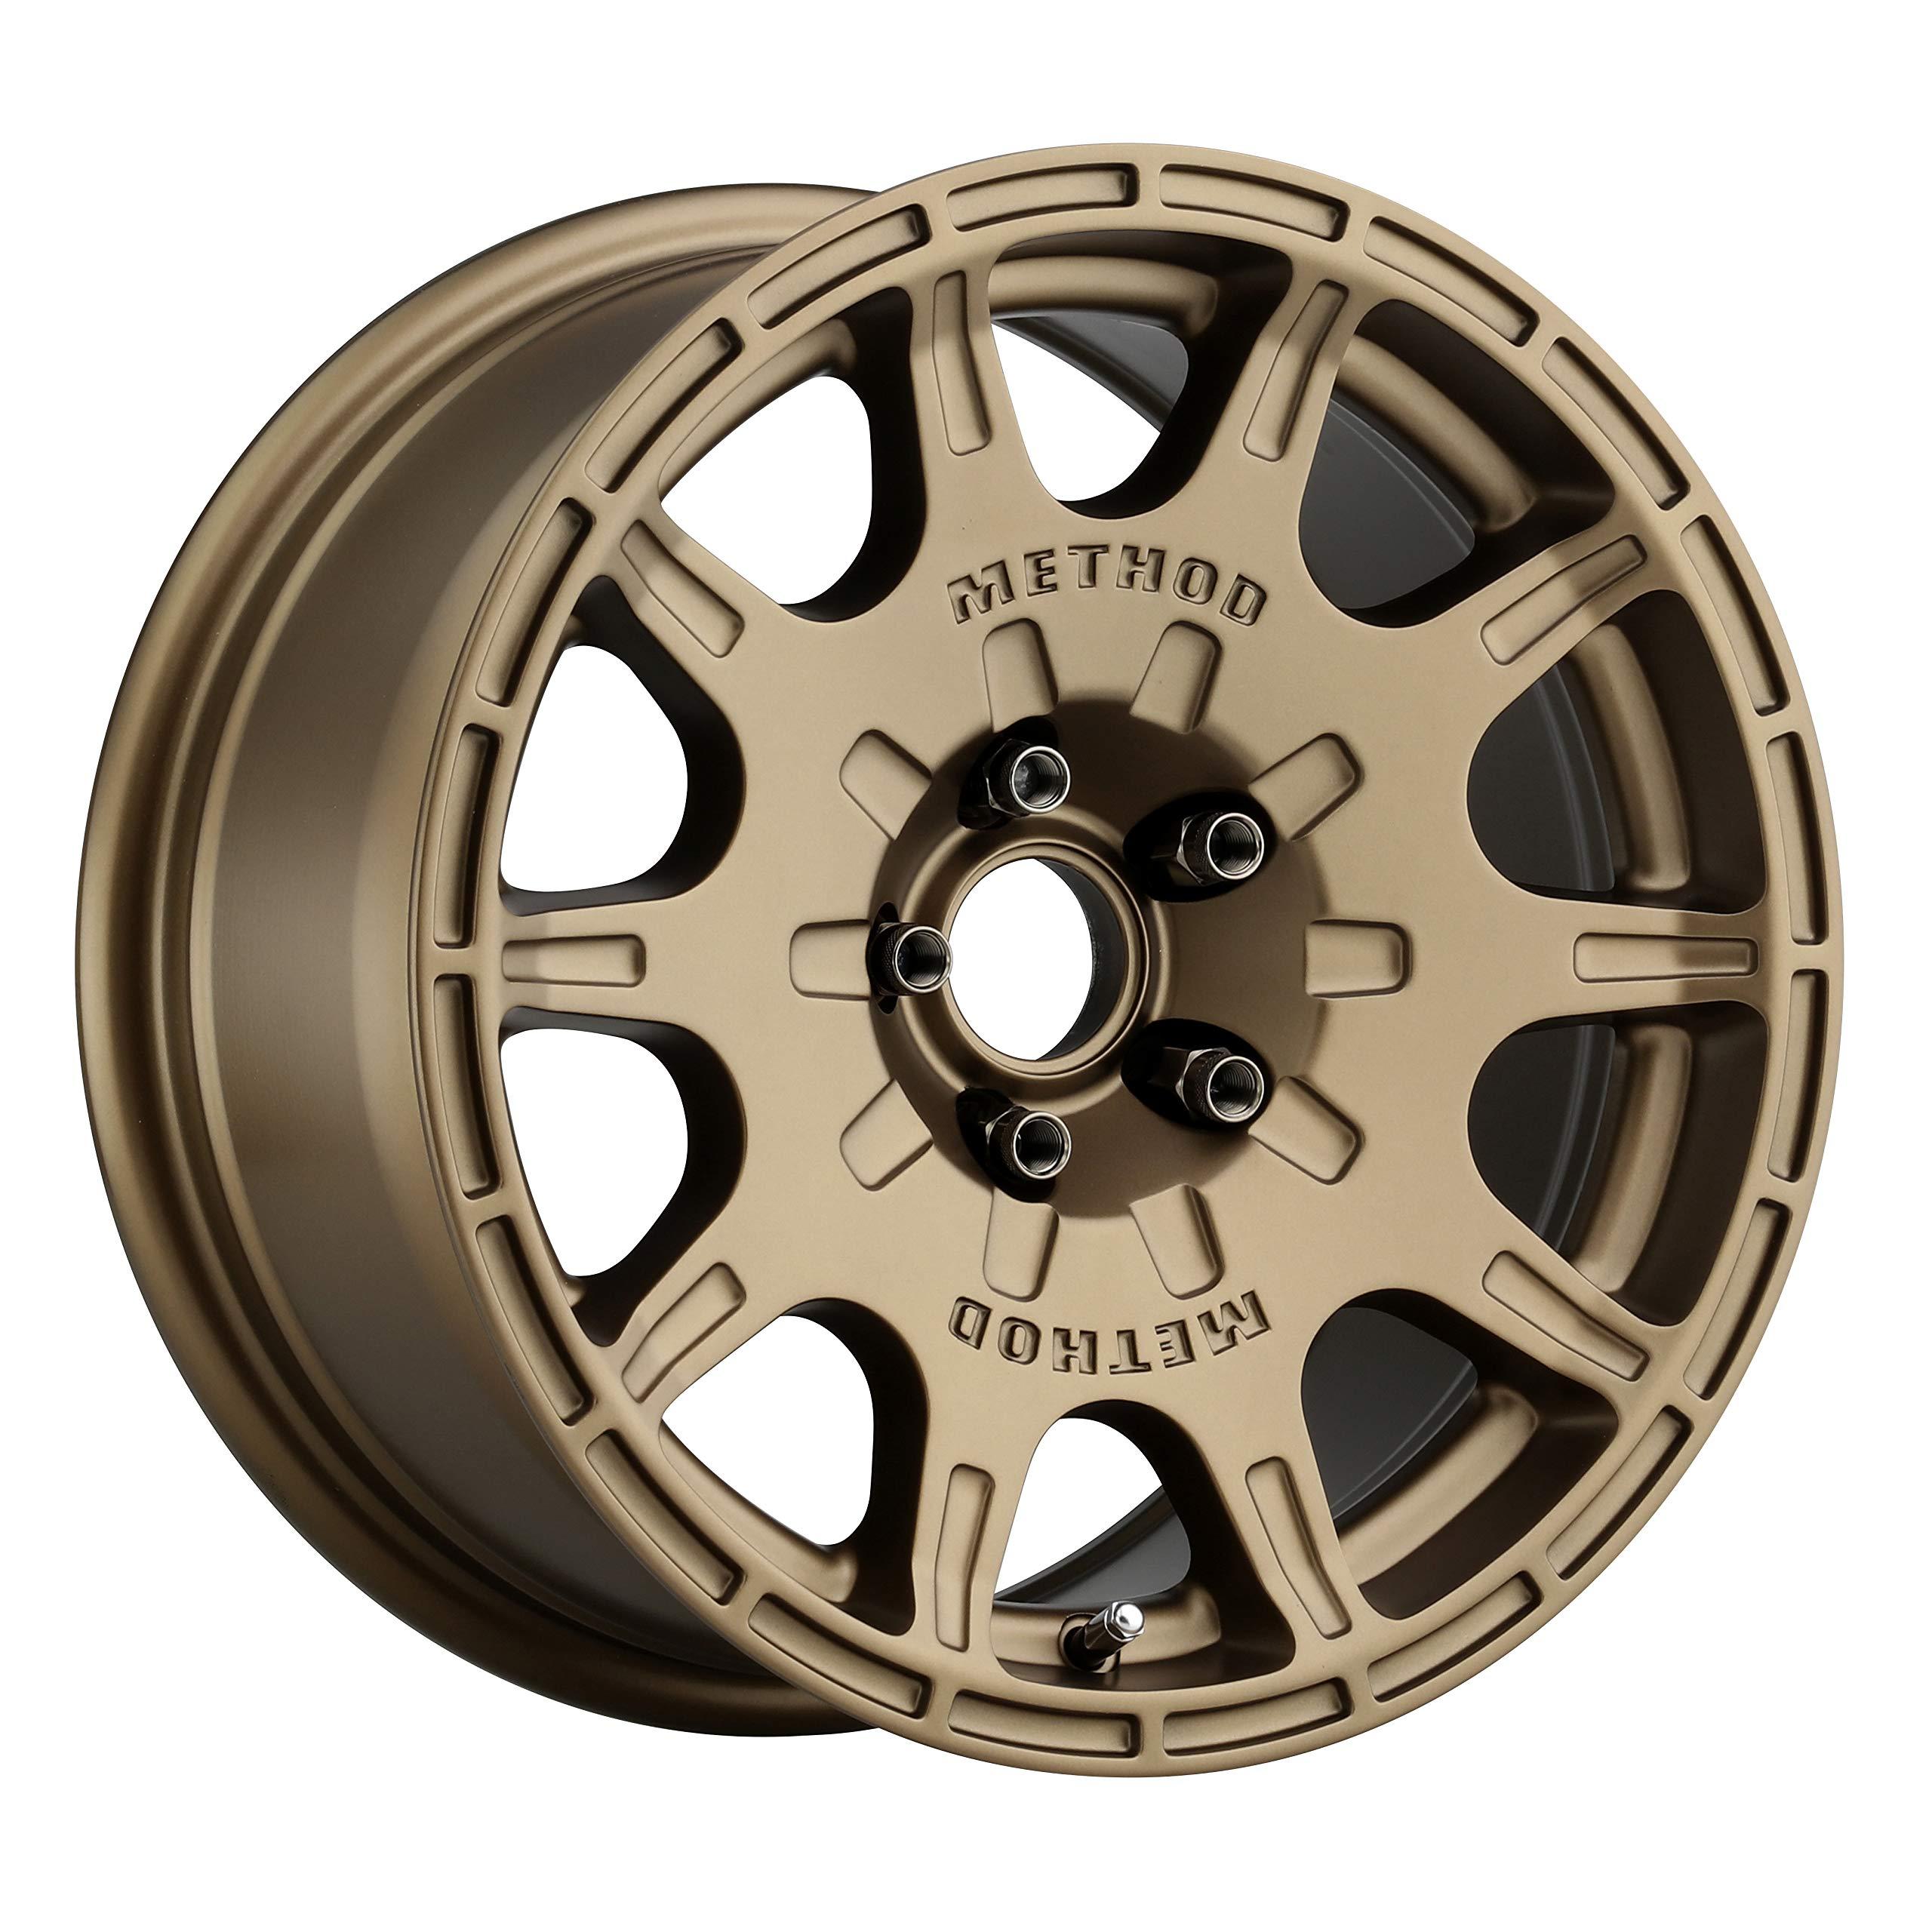 2017-2018 2.0 Matte Black for Polaris RANGER RZR XP 4 1000 HIGH LIFTER Edit 4//156 Method Race Wheels Mesh Wheel 14x7 5.0